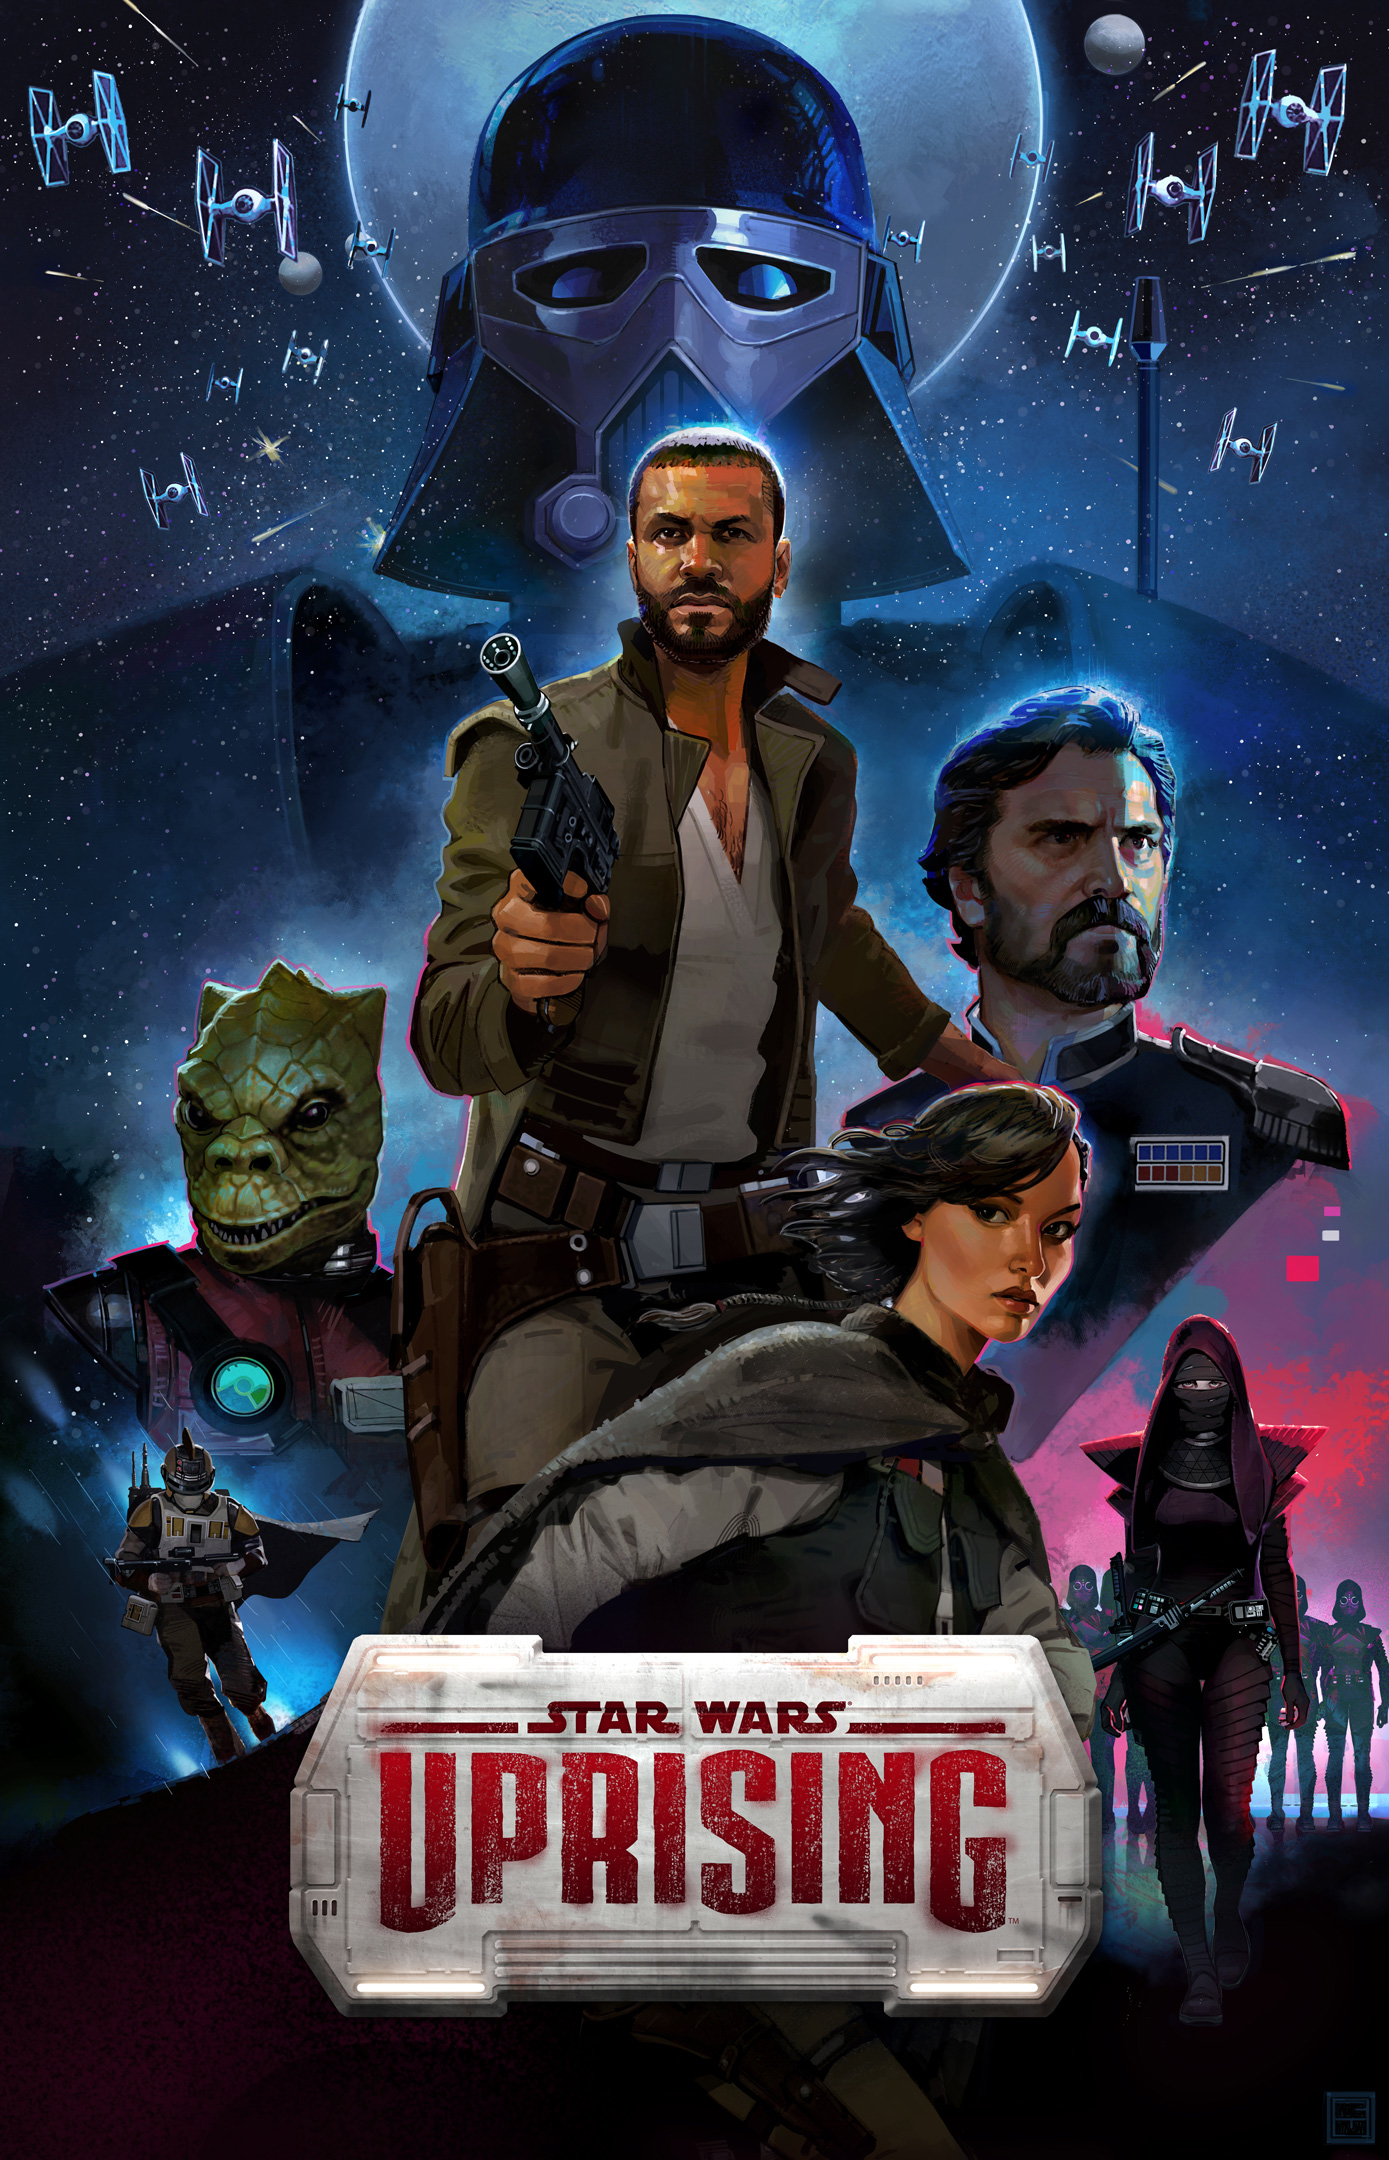 Star Wars Uprising Poster.png